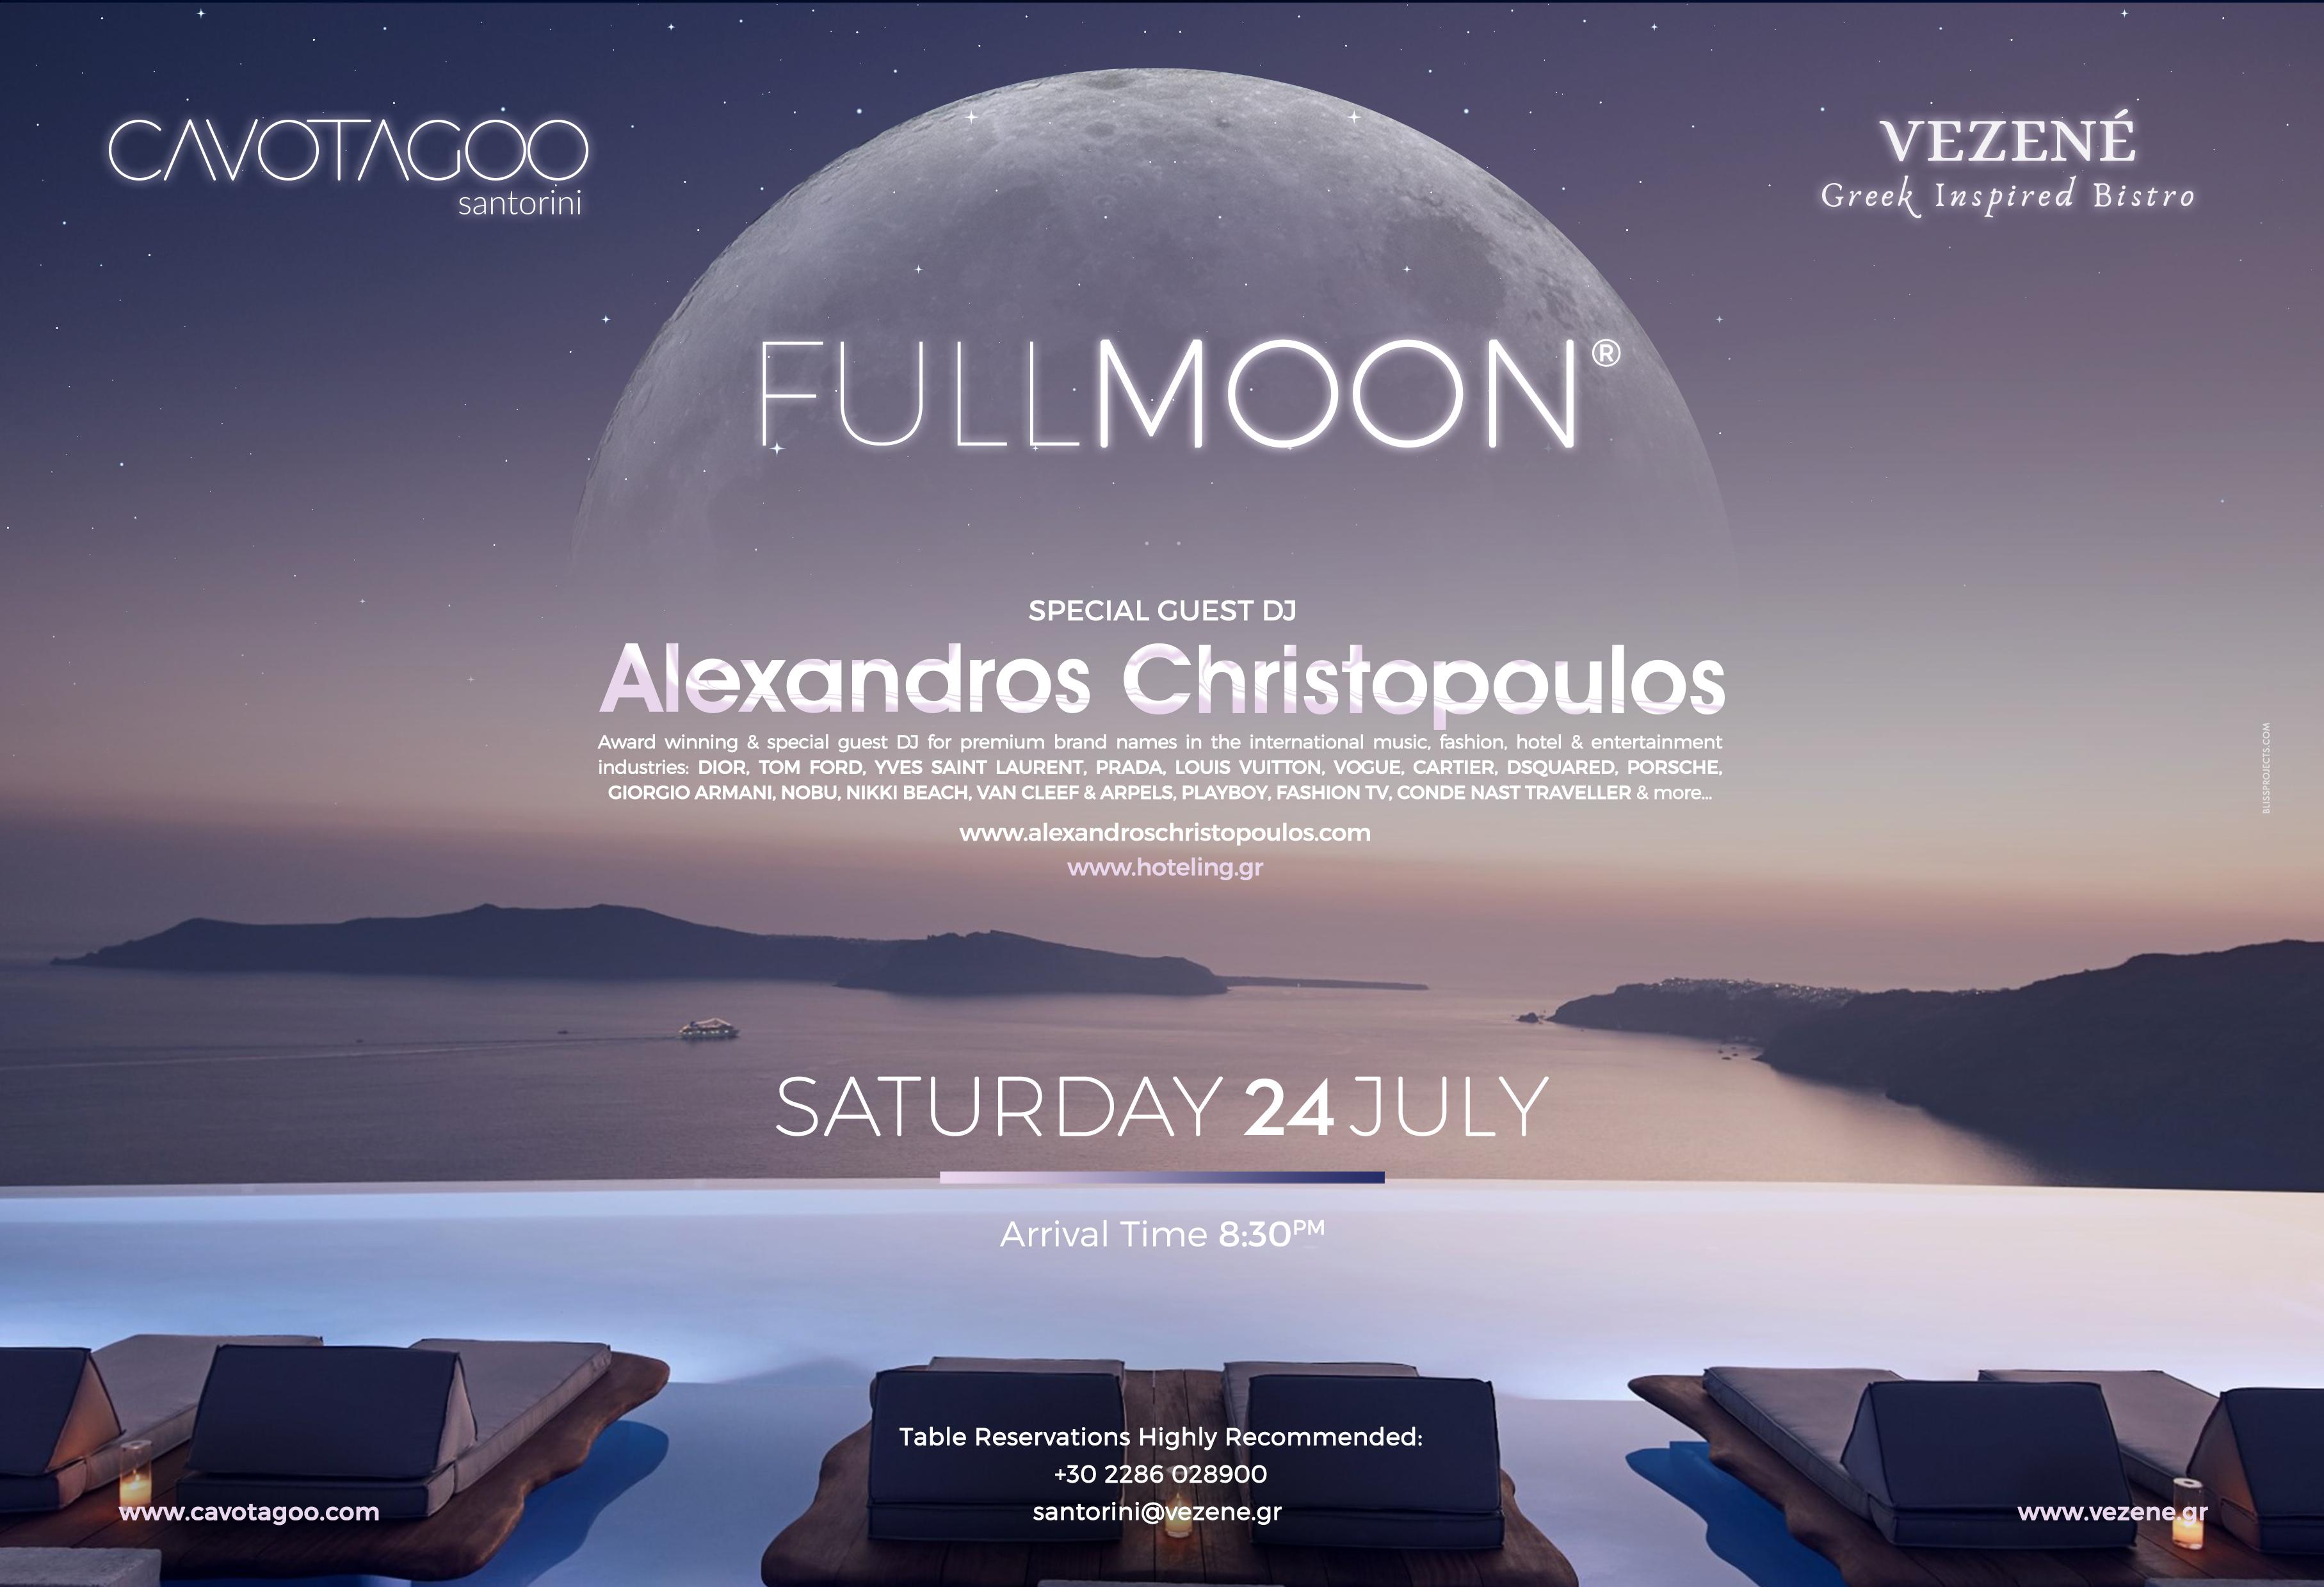 FULL MOON ® VEZENÉ | Cavo Tagoo Santorini